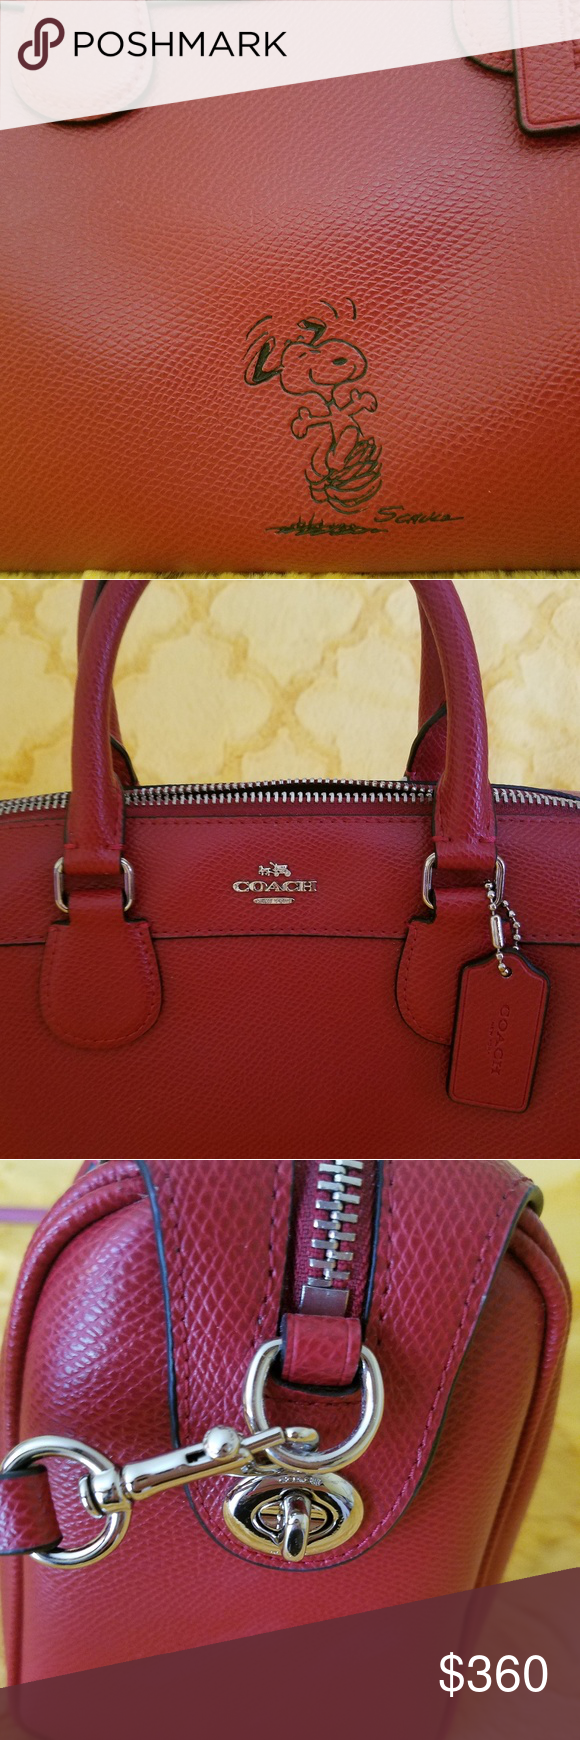 82ba0299208ba Coach Peanuts Snoopy mini Bennett Satchel Never used Authentic Coach red  mini satchel. I